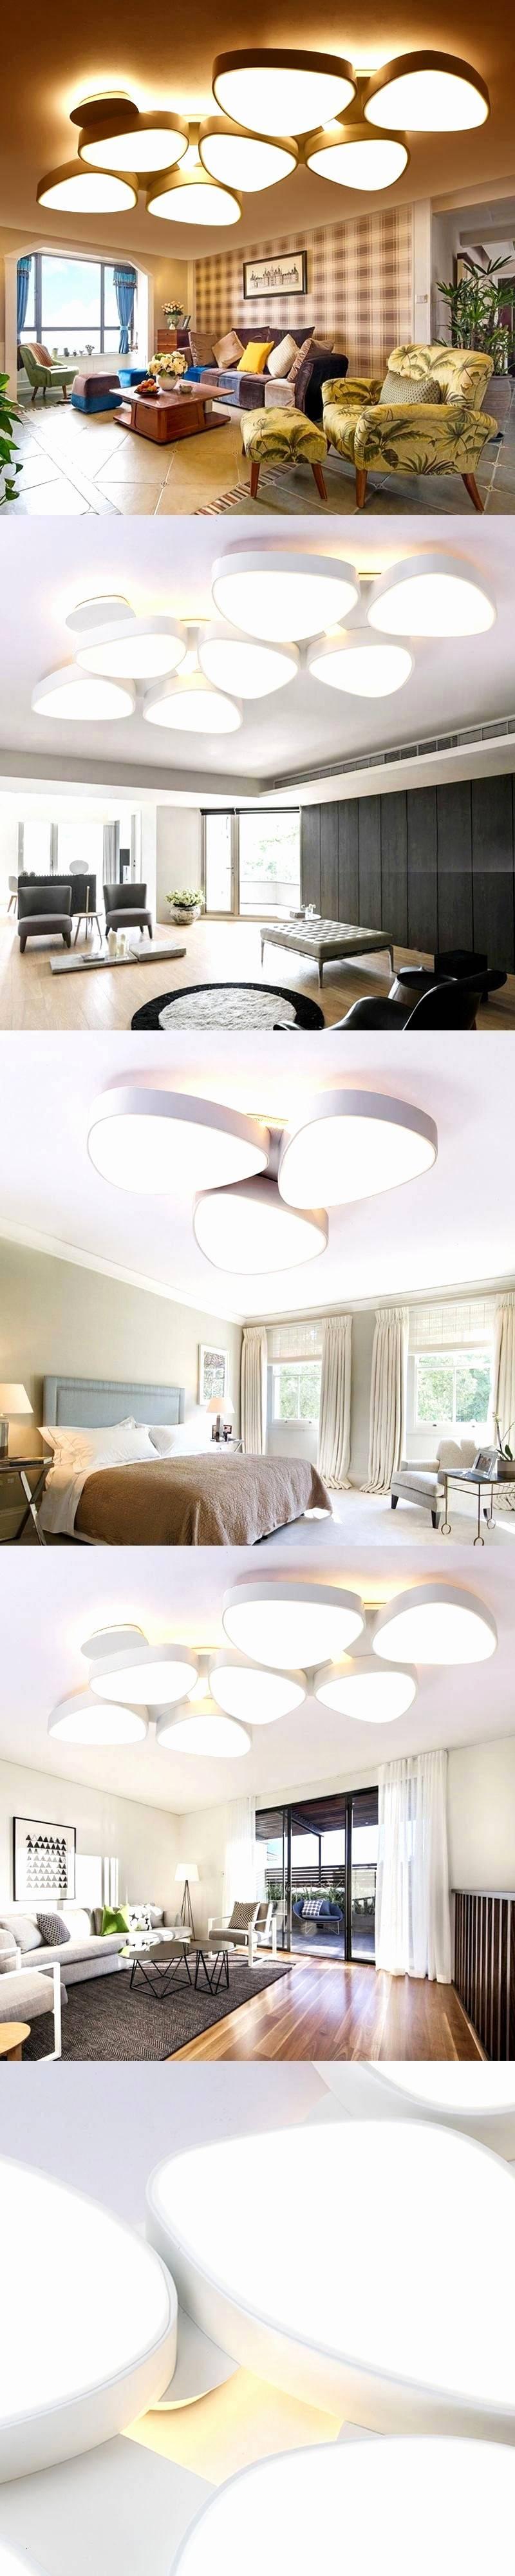 master bedroom ceiling decor beautiful luxury master bedroom ceiling designs sundulqq of master bedroom ceiling decor